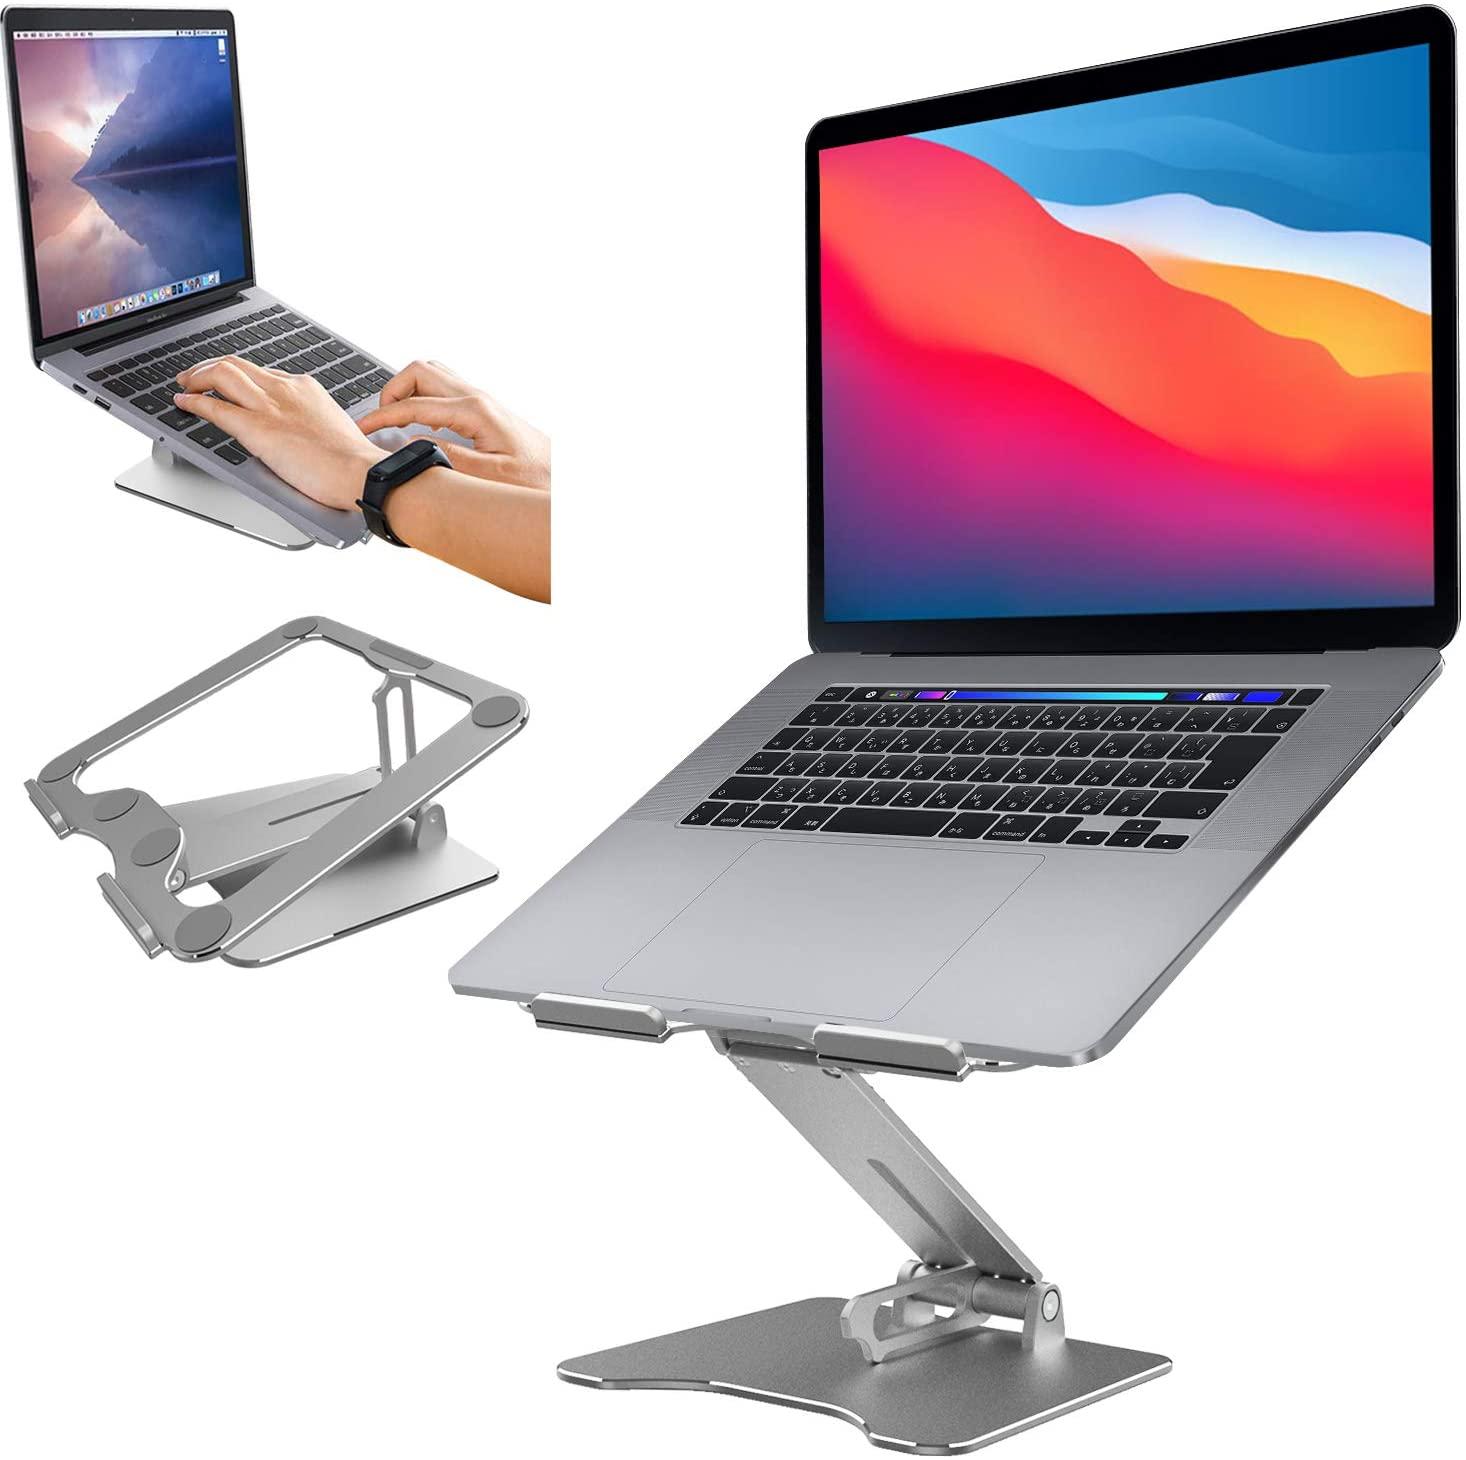 Ergonomic Height Angle Adjustable Computer Laptop Holder for $19.99 Shipped! (Reg.Price $39.99)